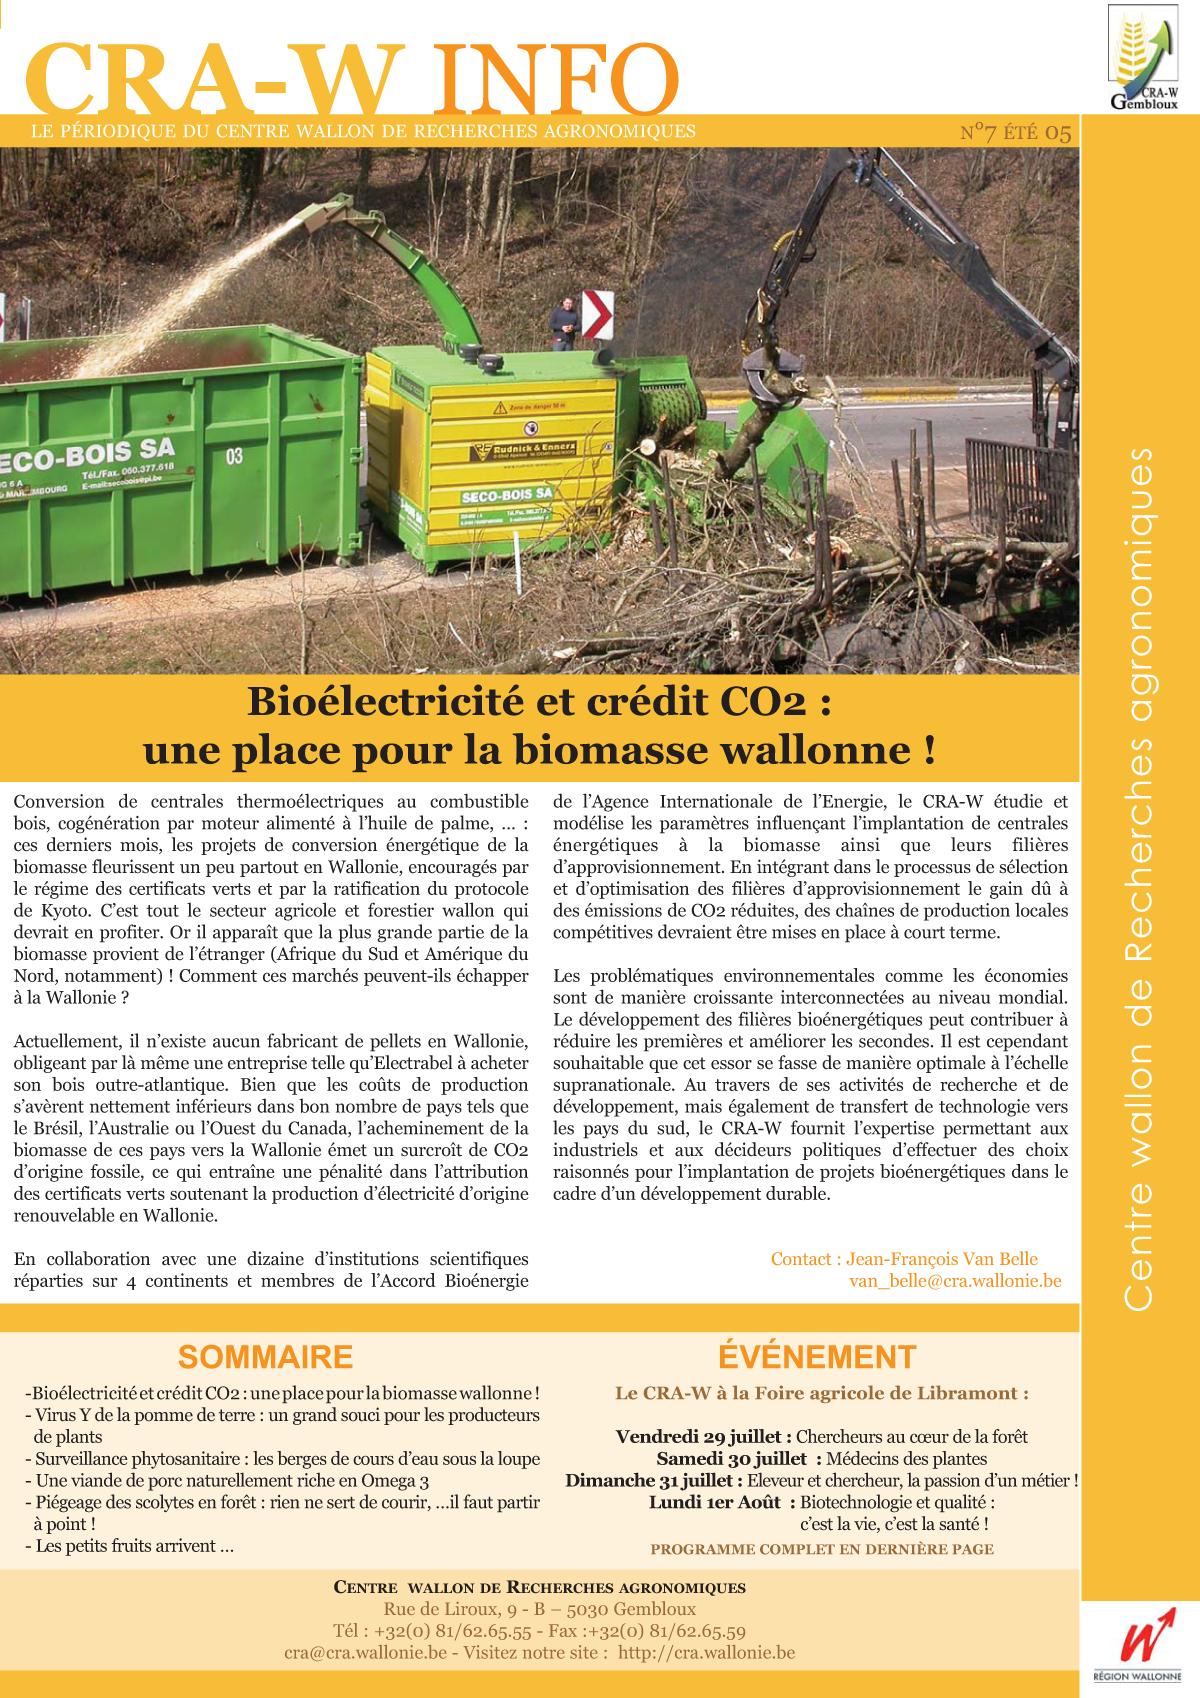 CRAW info n° 7